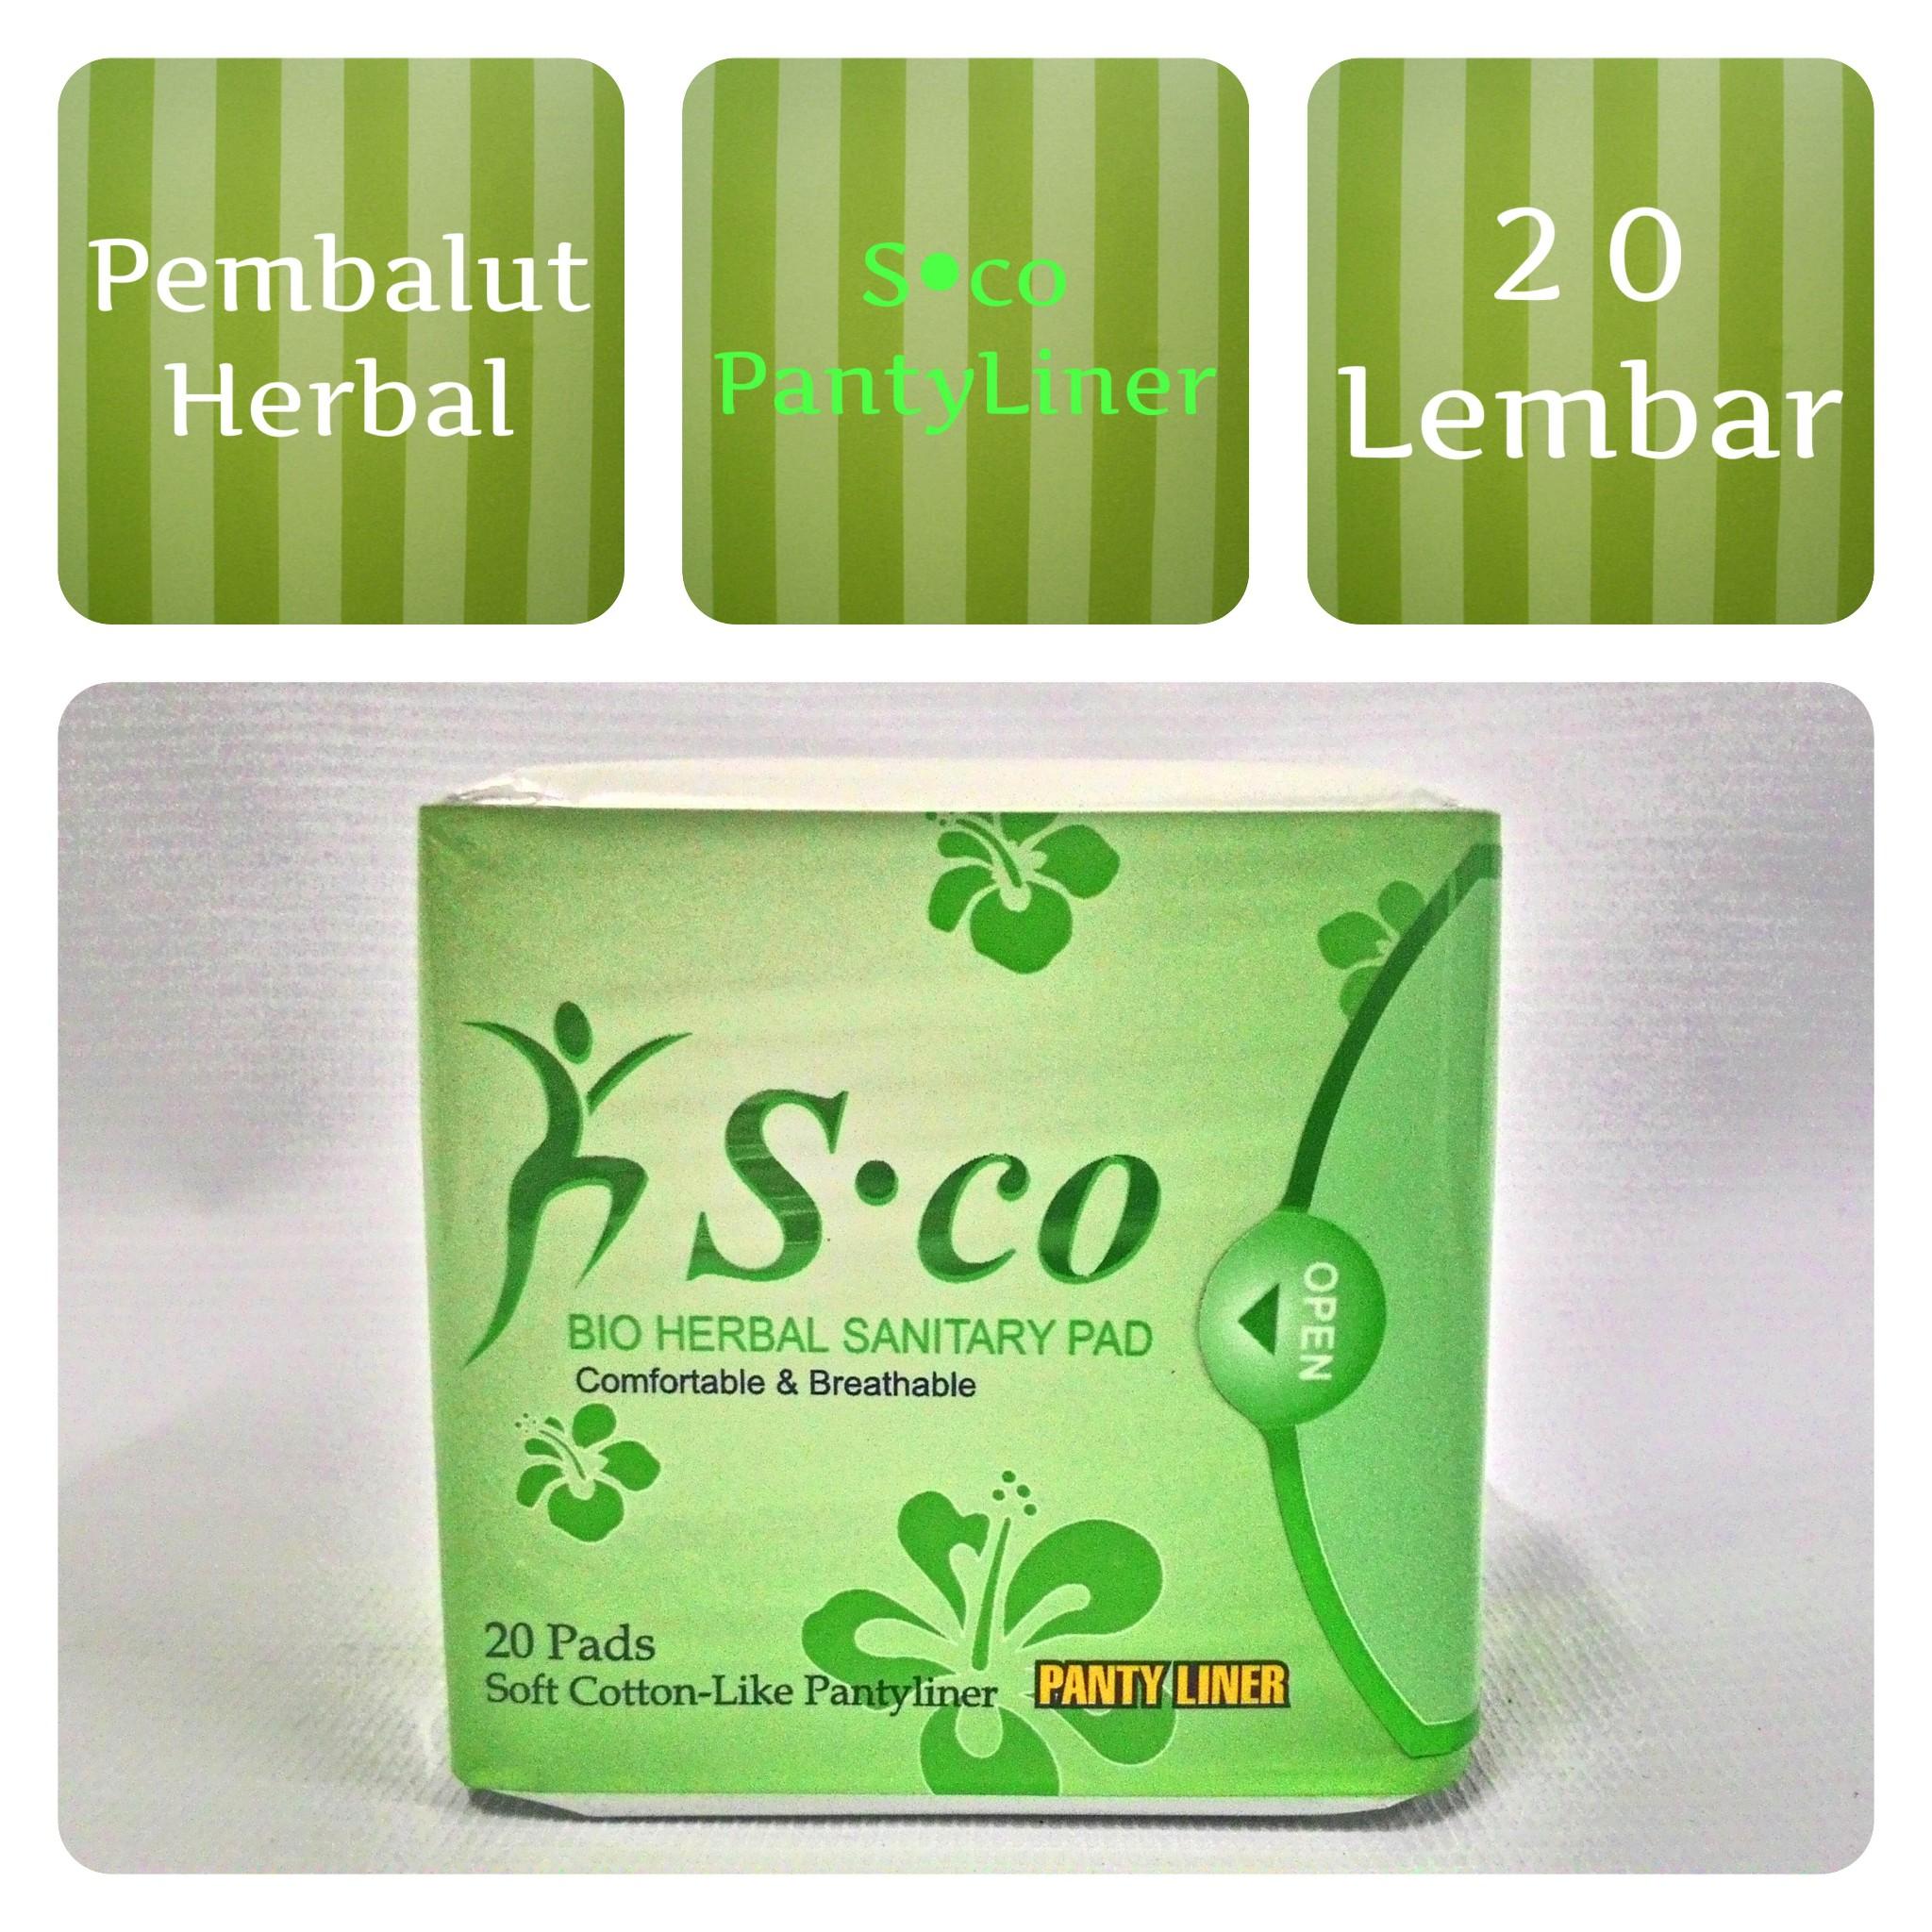 Lucky Avail Pembalut Herbal Feminine Comfort Sanitary Pad Day Biru Sco Use Source Harga Hibis